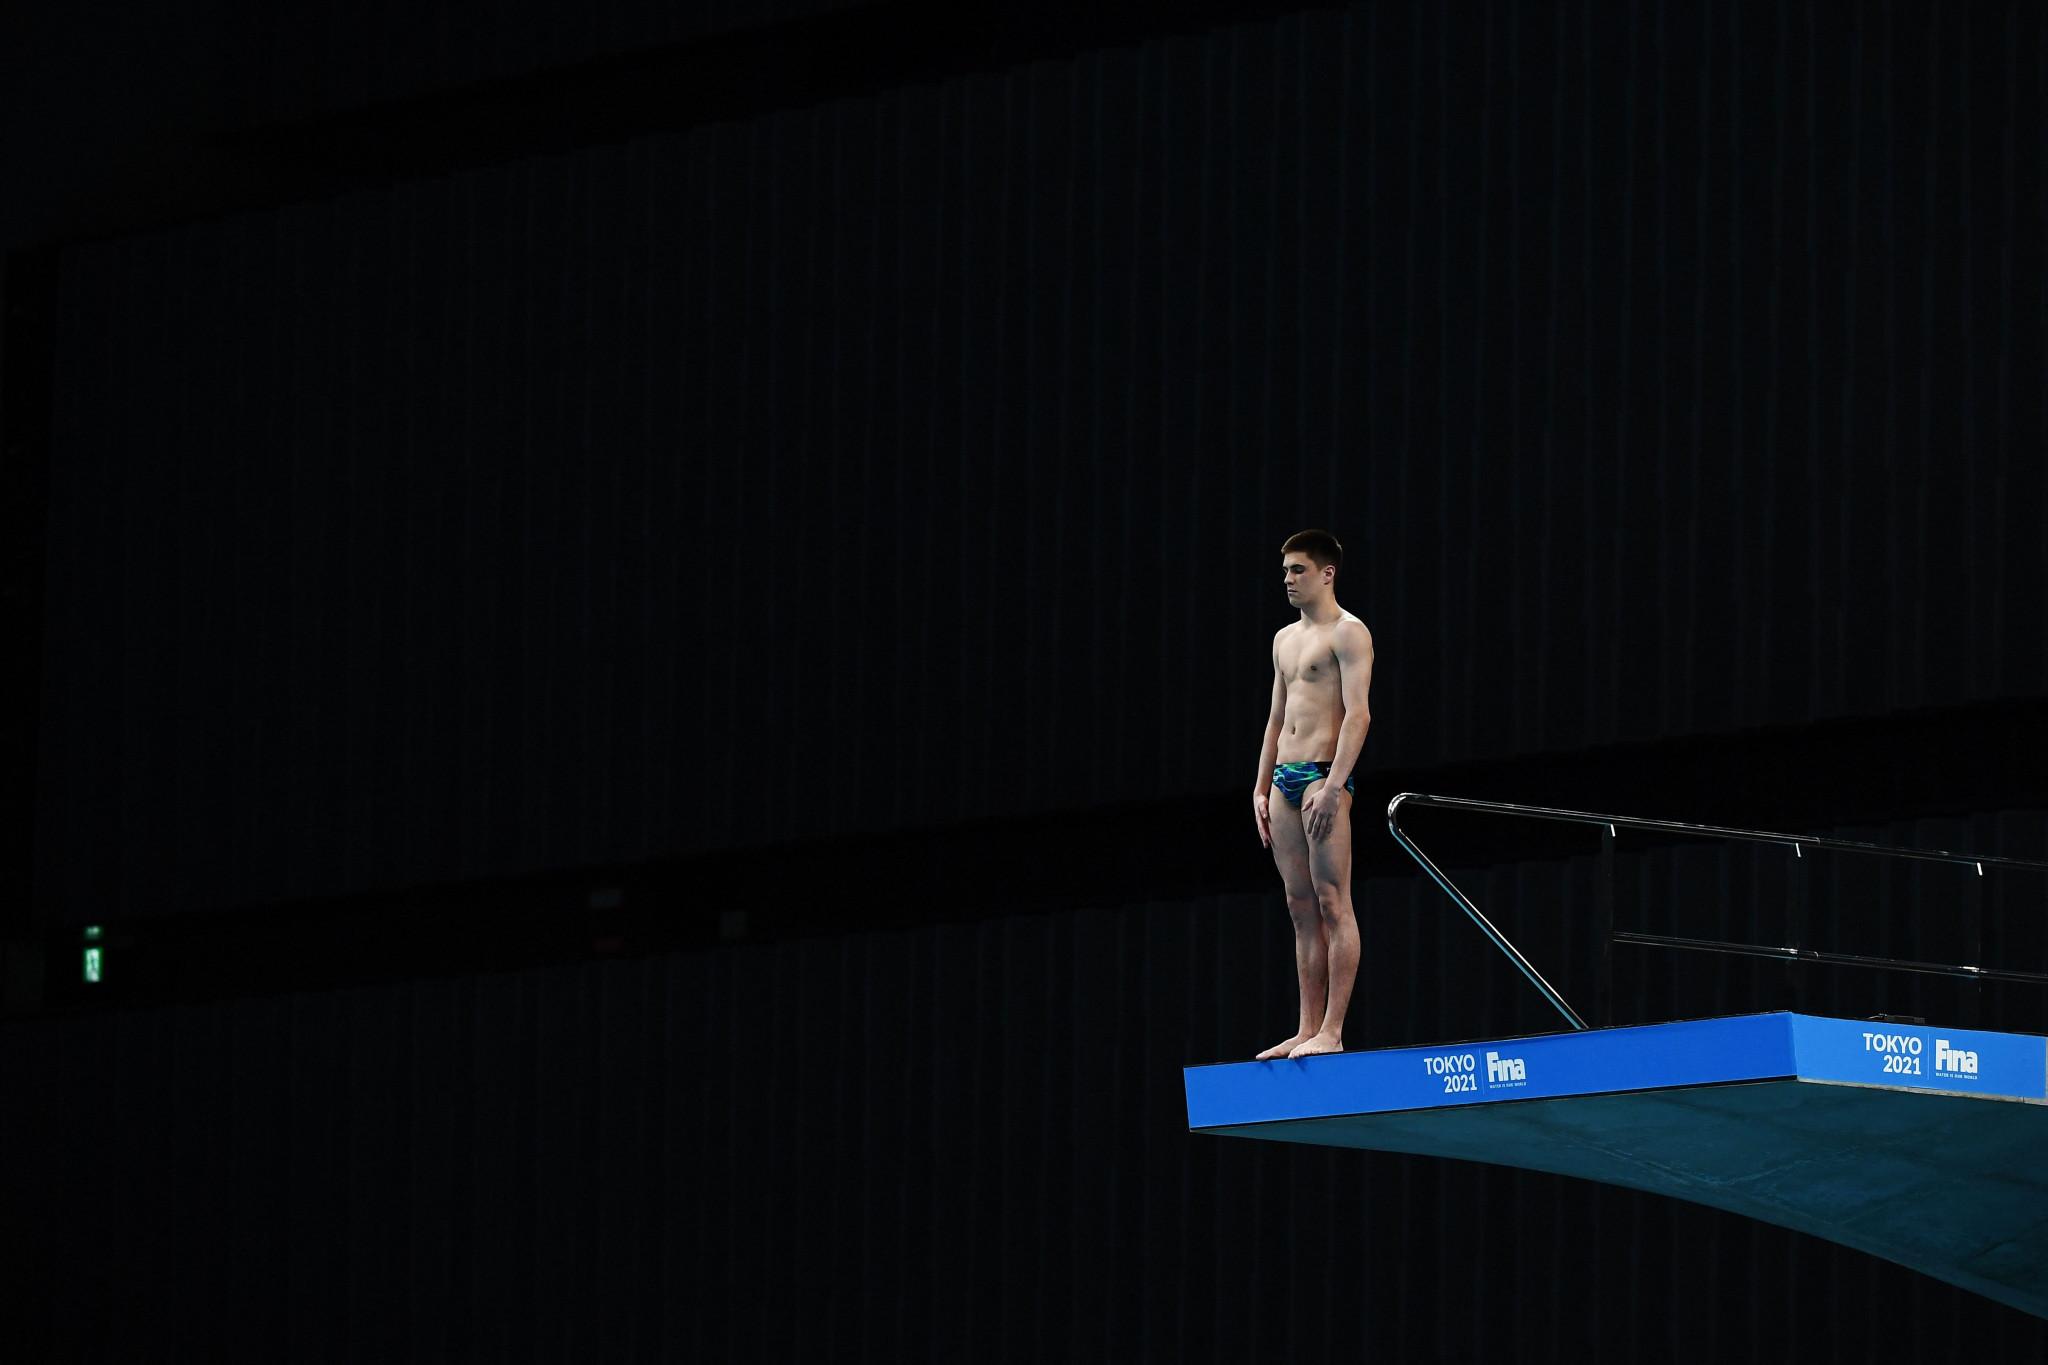 Ruslan Ternovoi led the men's 10m platform semi-final ©Getty Images